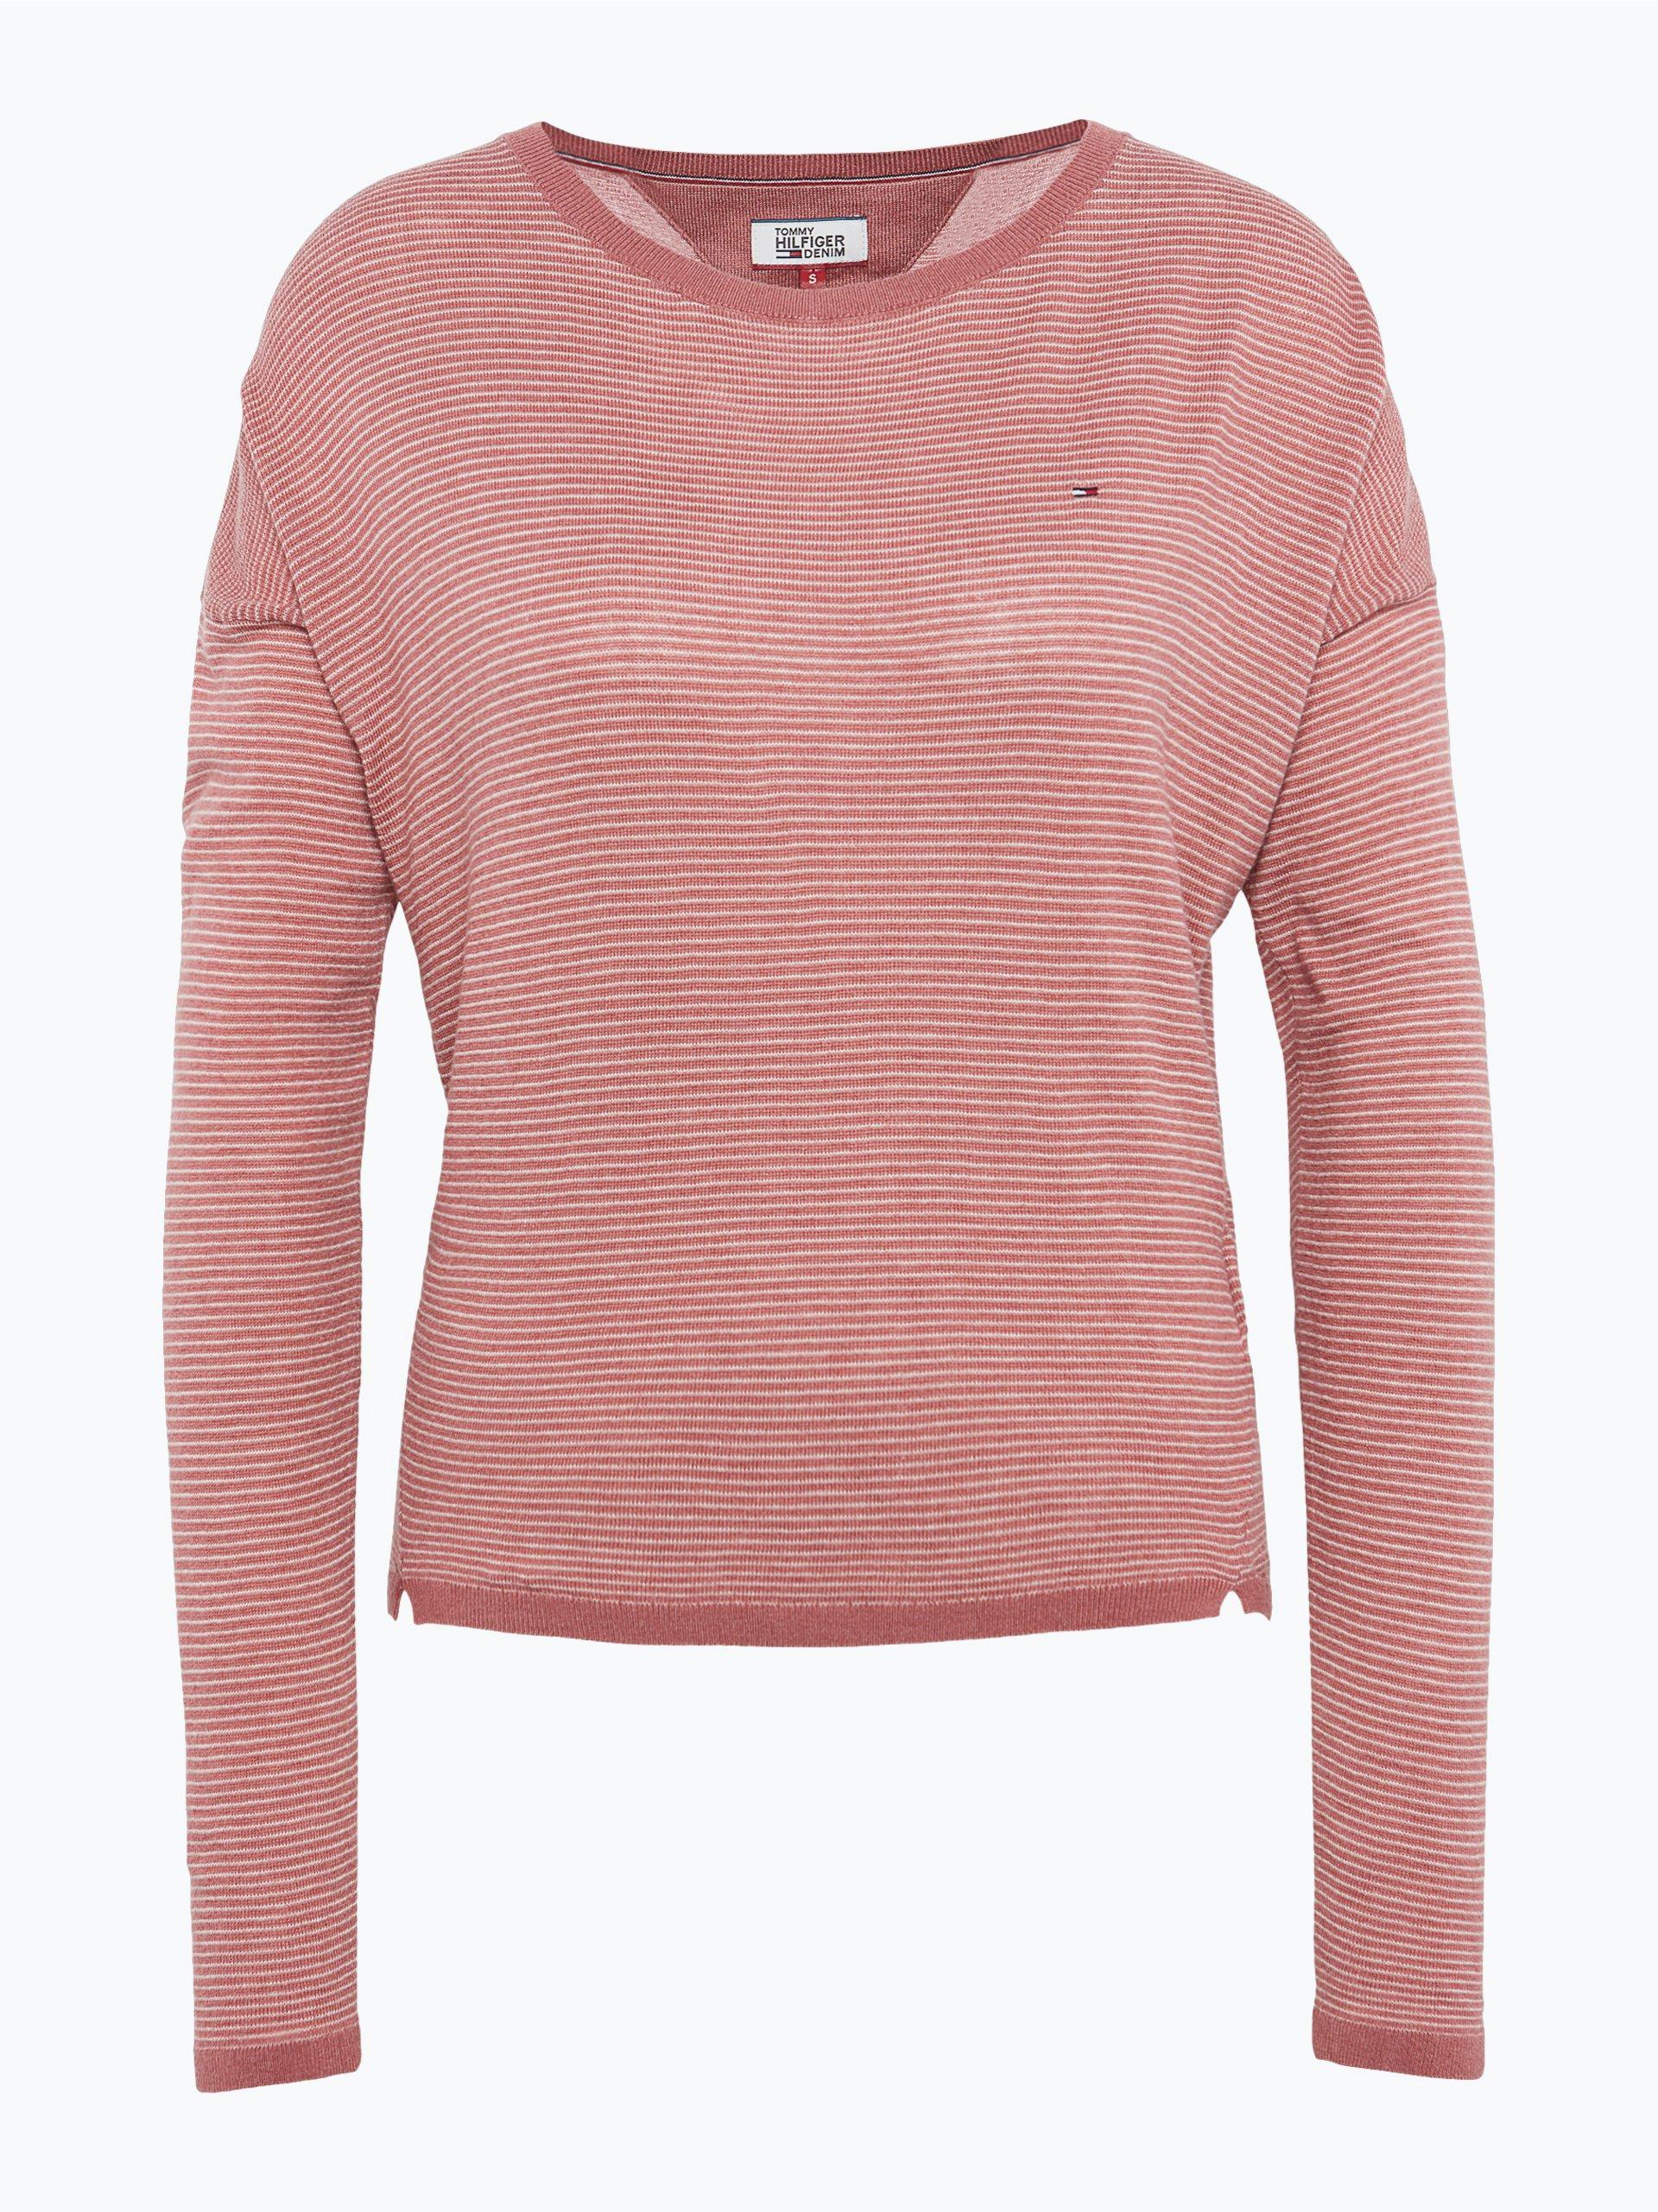 hilfiger denim damen pullover rosa gestreift online kaufen. Black Bedroom Furniture Sets. Home Design Ideas